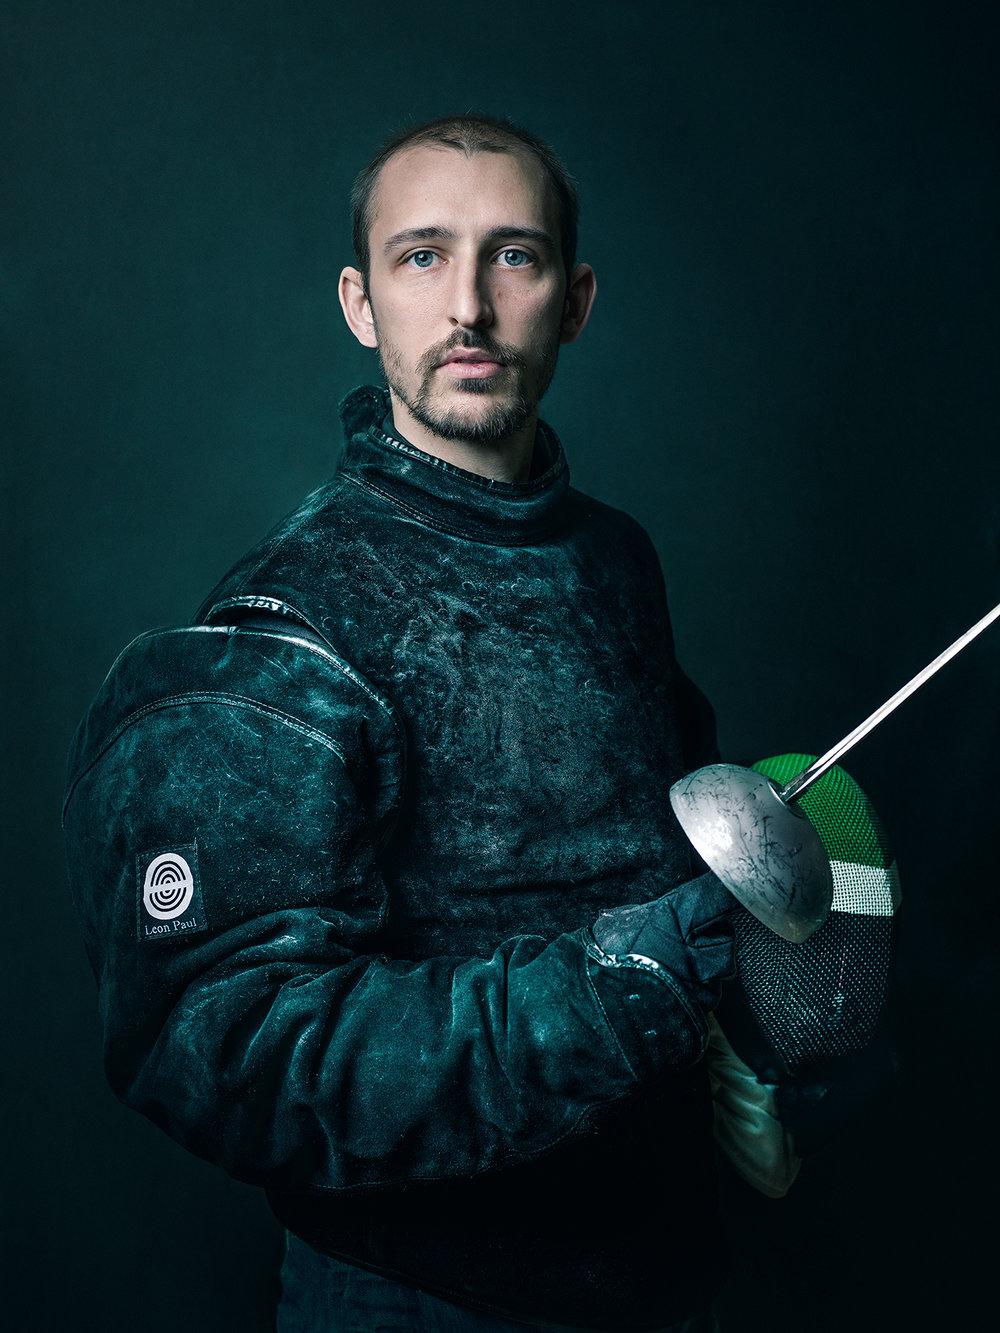 Oscar-arribas-esgrima-maestro-fencing-master-fencer-fechten-scherma-escrime-portrait-fotografo-retrato-photographer022.jpg